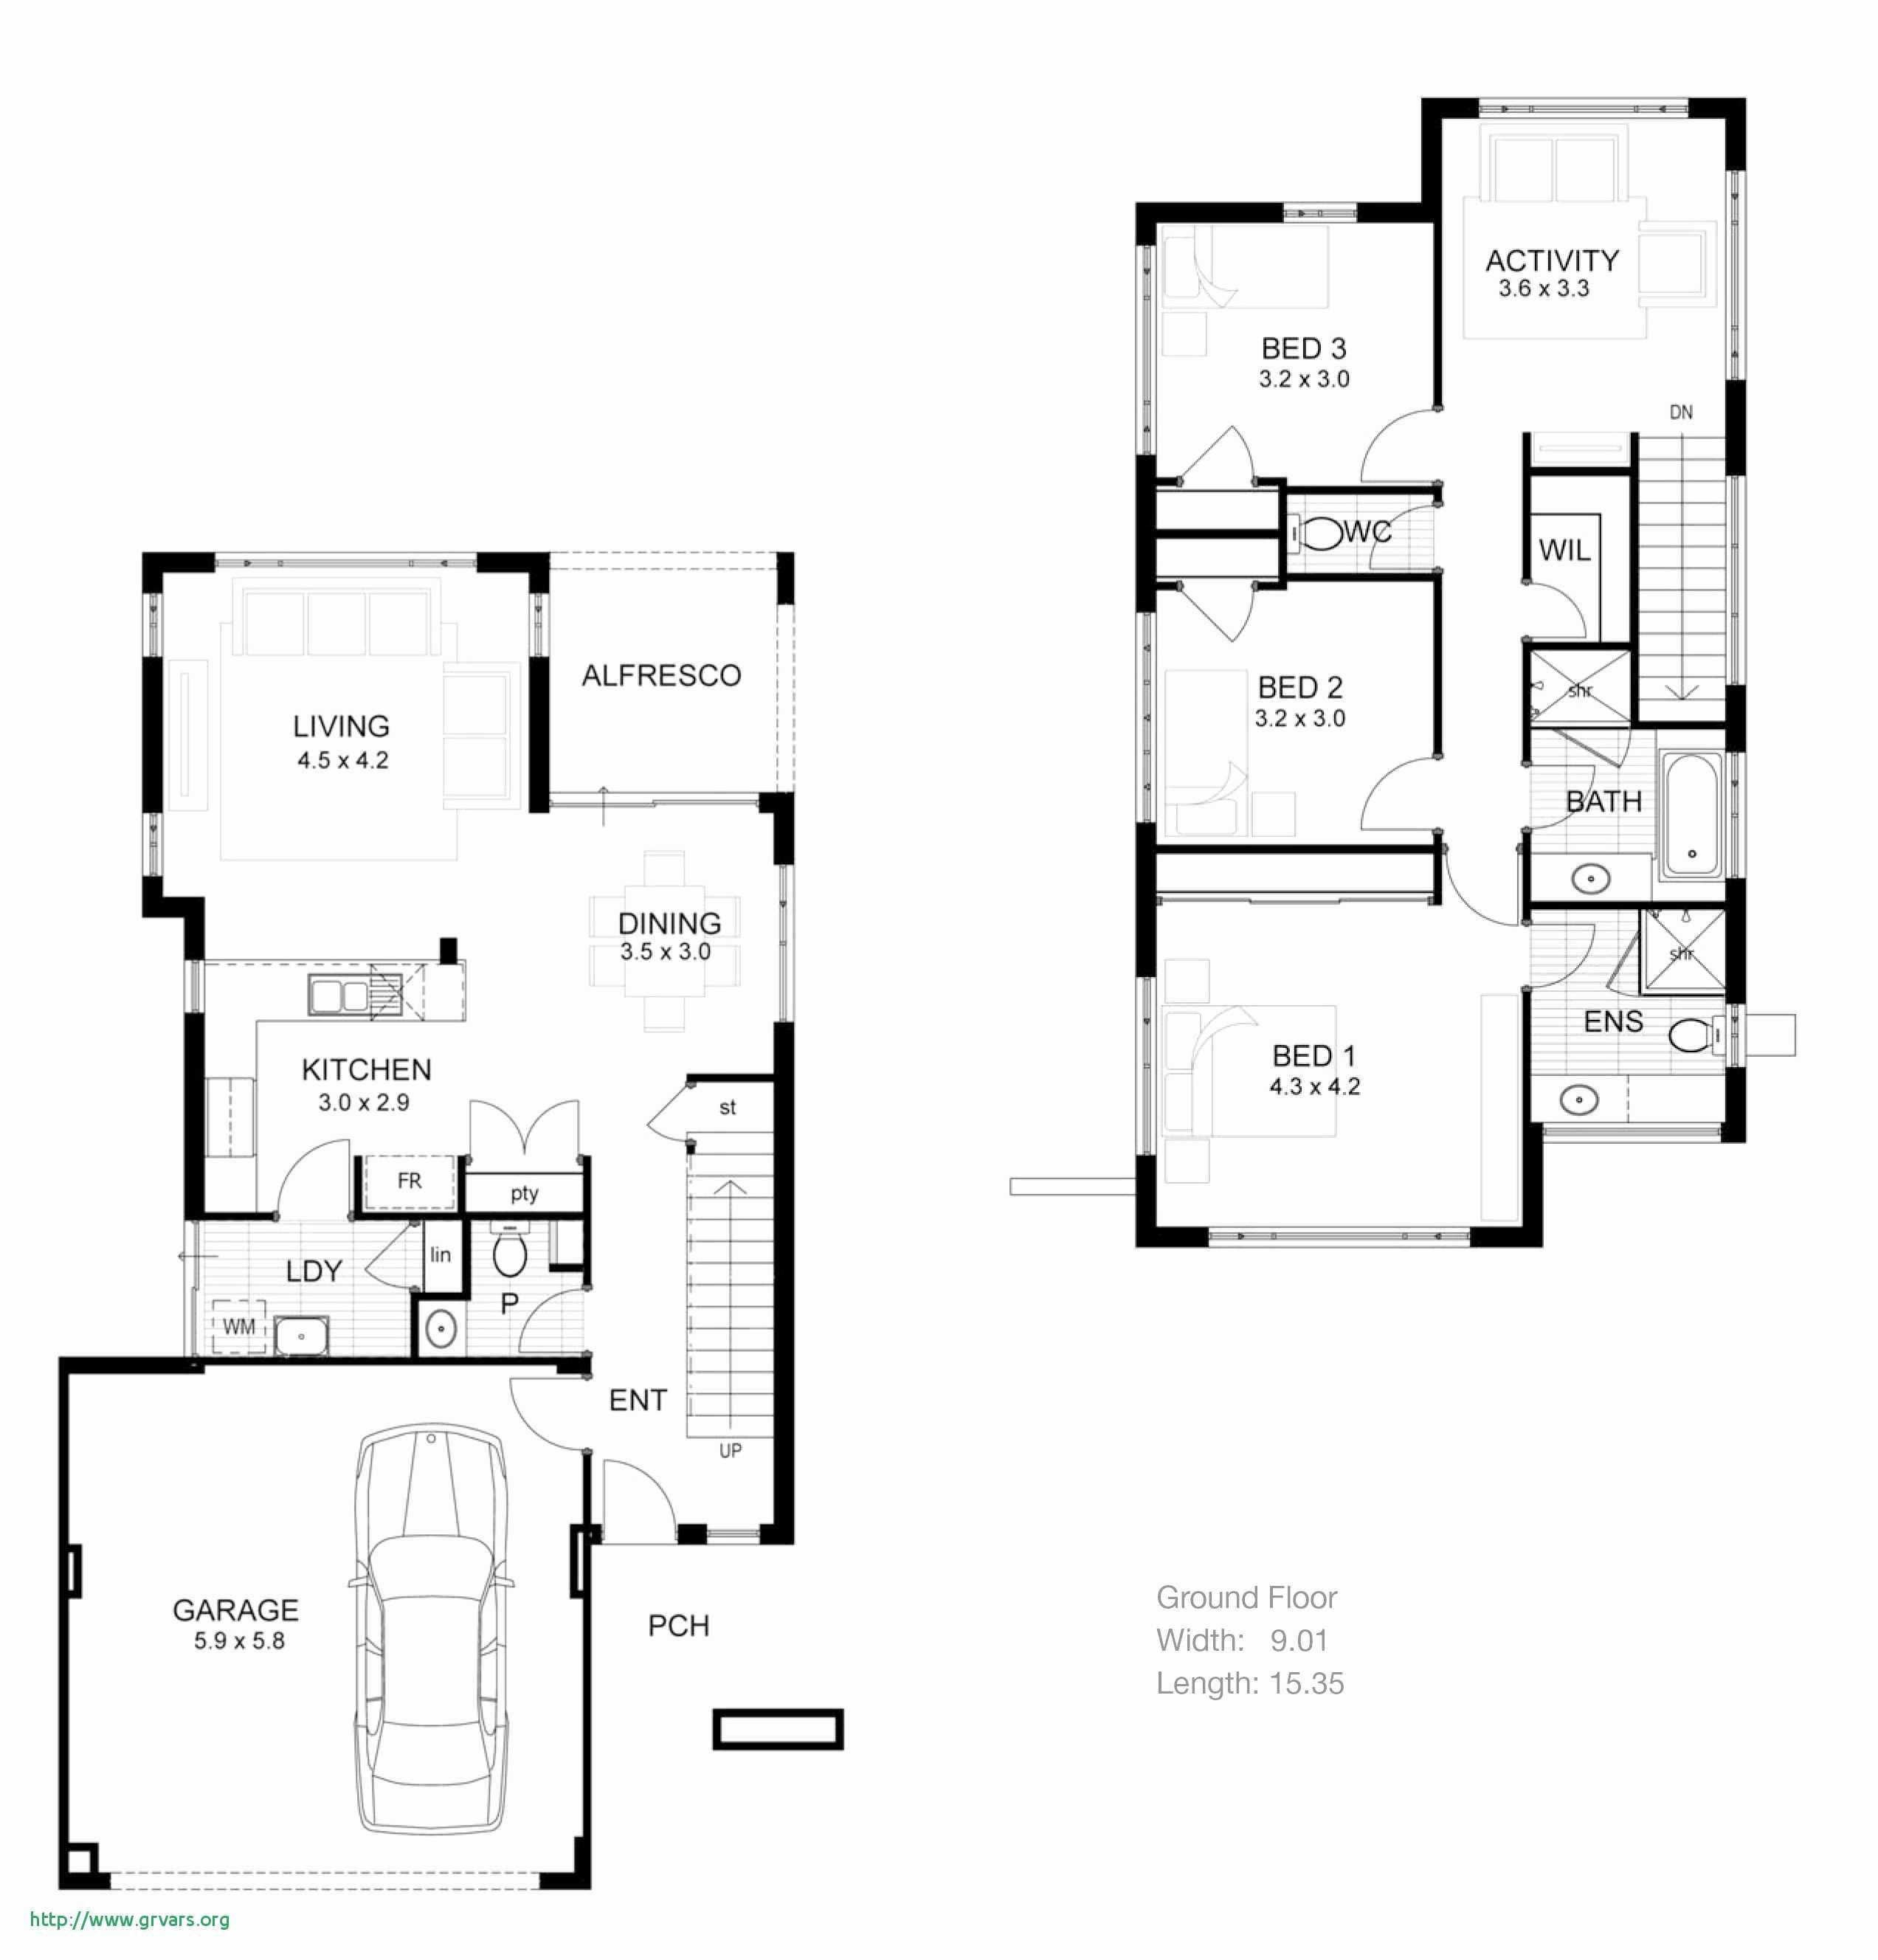 Hardwood Flooring Hilo Hawaii Of 18 Meilleur De Floors Of Hawaii Ideas Blog within Disc Golf Hawaii Floor Plans New Floor Plans Lovely Design Plan 0d House and